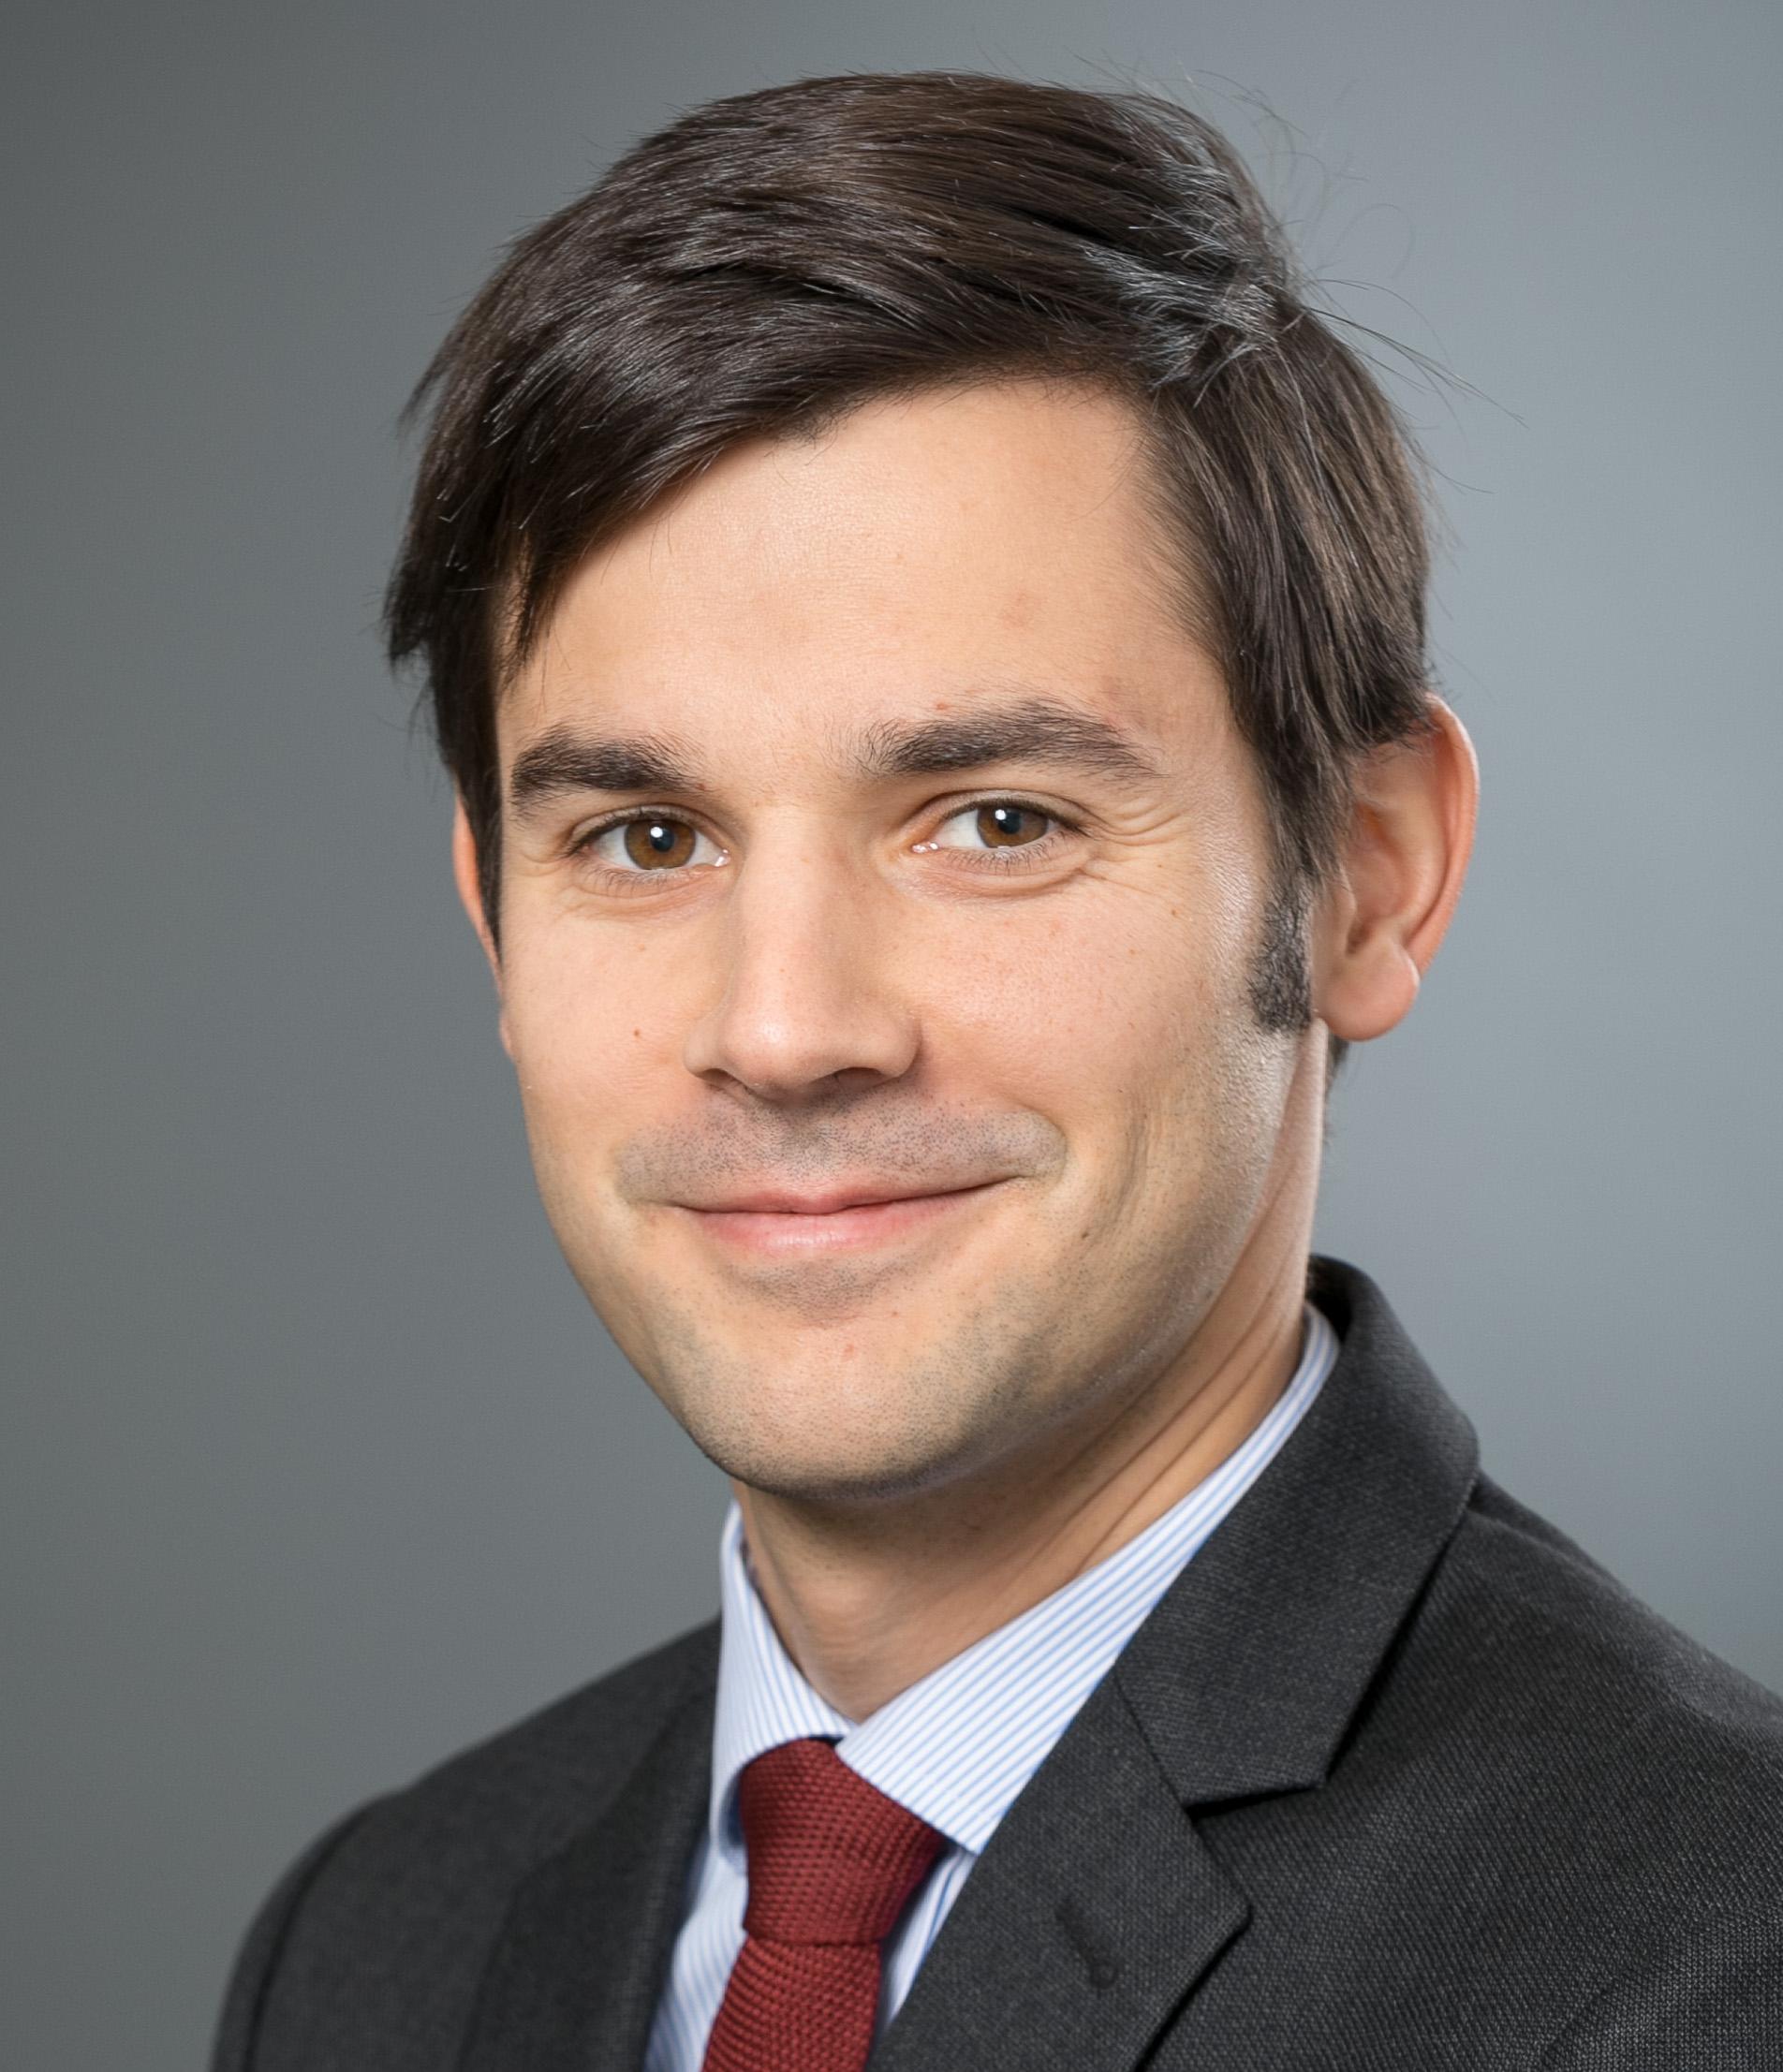 Antoine Gaschignard (RCI Bank and Services)